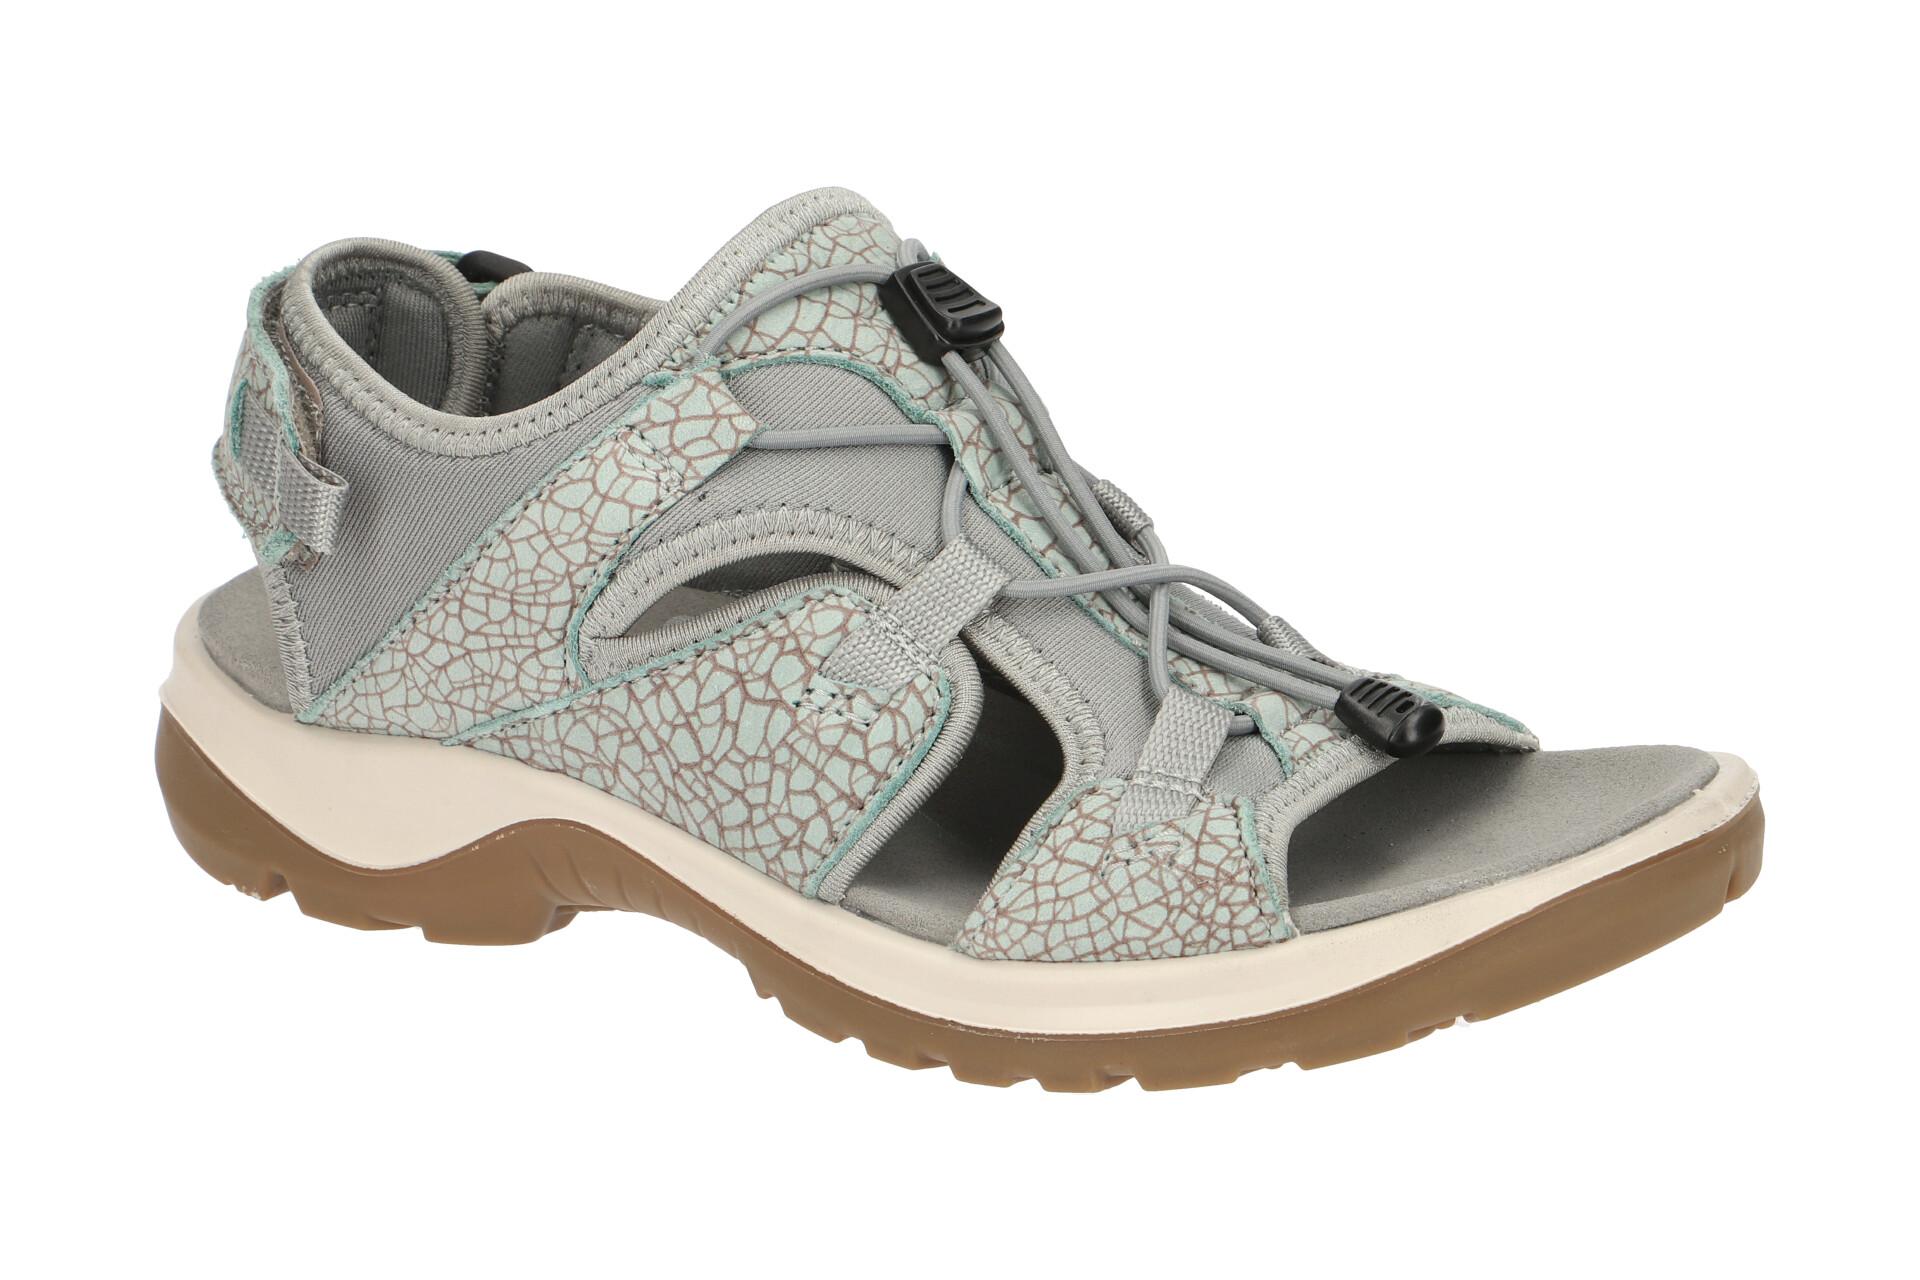 Ecco Schuhe Grün Outdoor Zu 82214351340 Sandaletten Sandale Details Damen Offroad Trekking m0wv8Nn